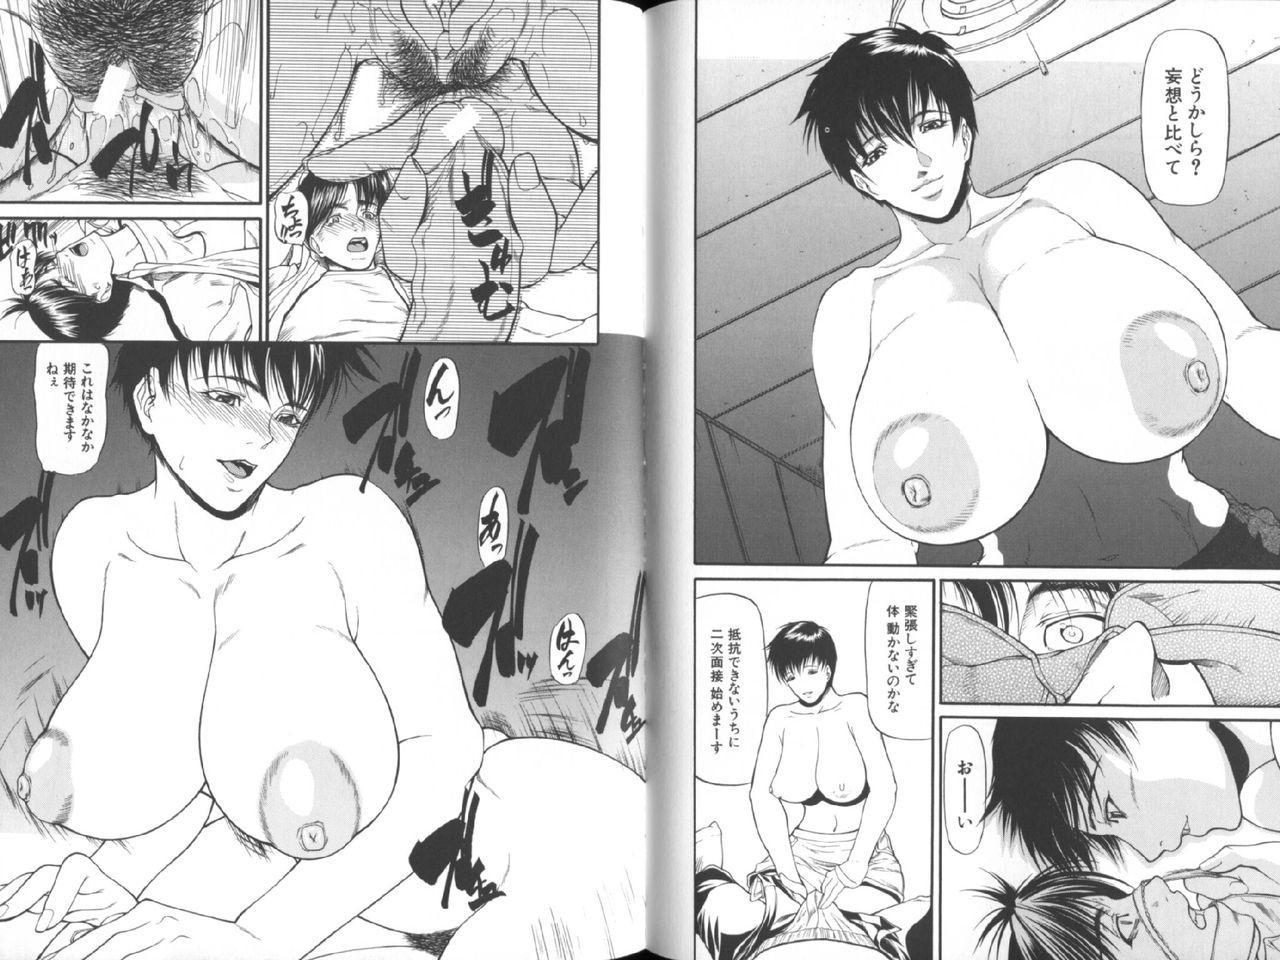 Senjou - A Desire is Instigated 48